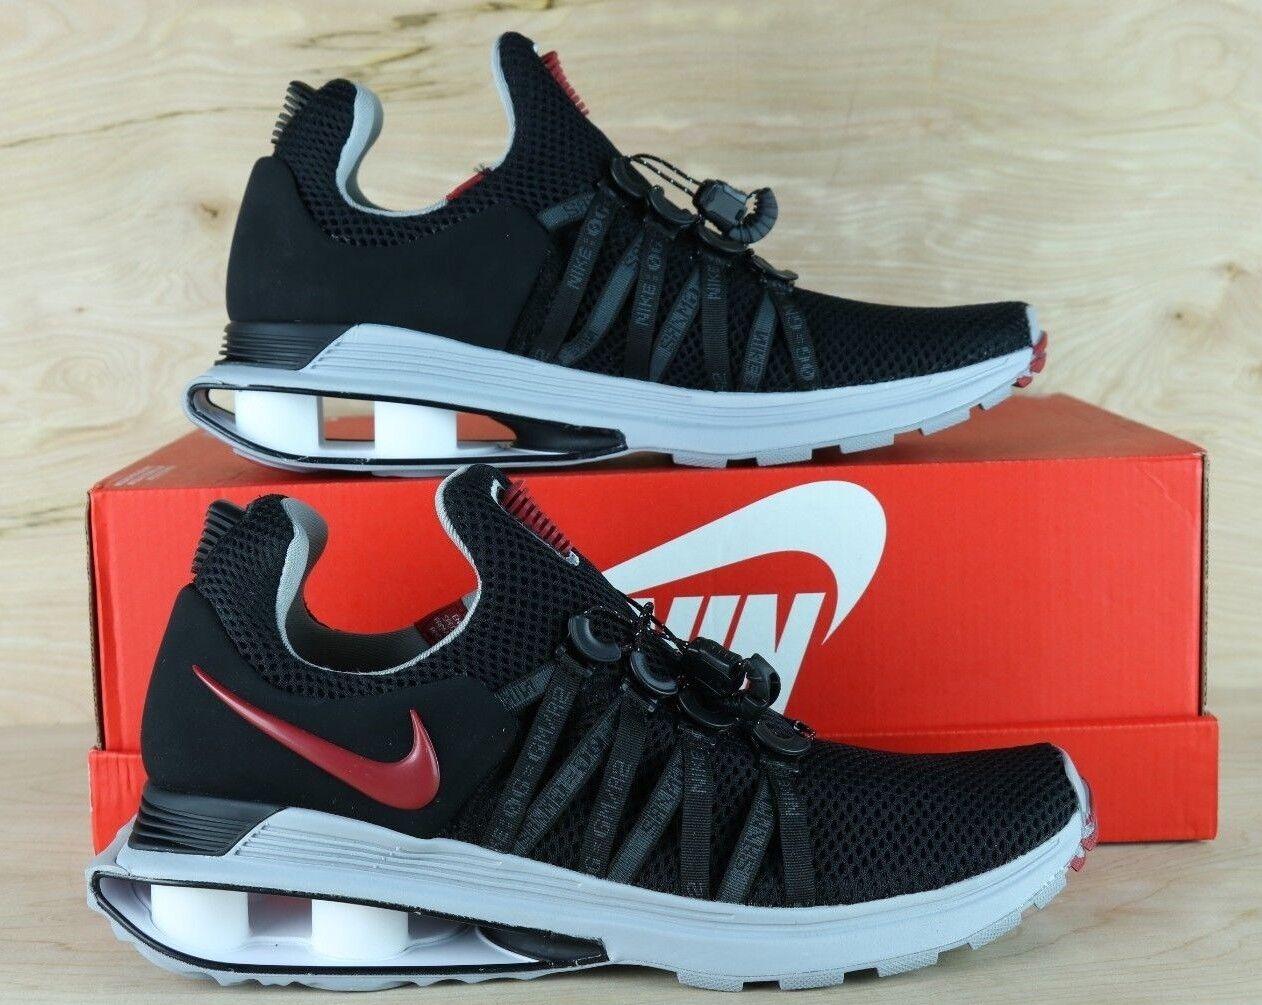 Nike SHOX Gravity Mens Running shoes Black Varsity Red AR1999 016 [ Multi Size ]